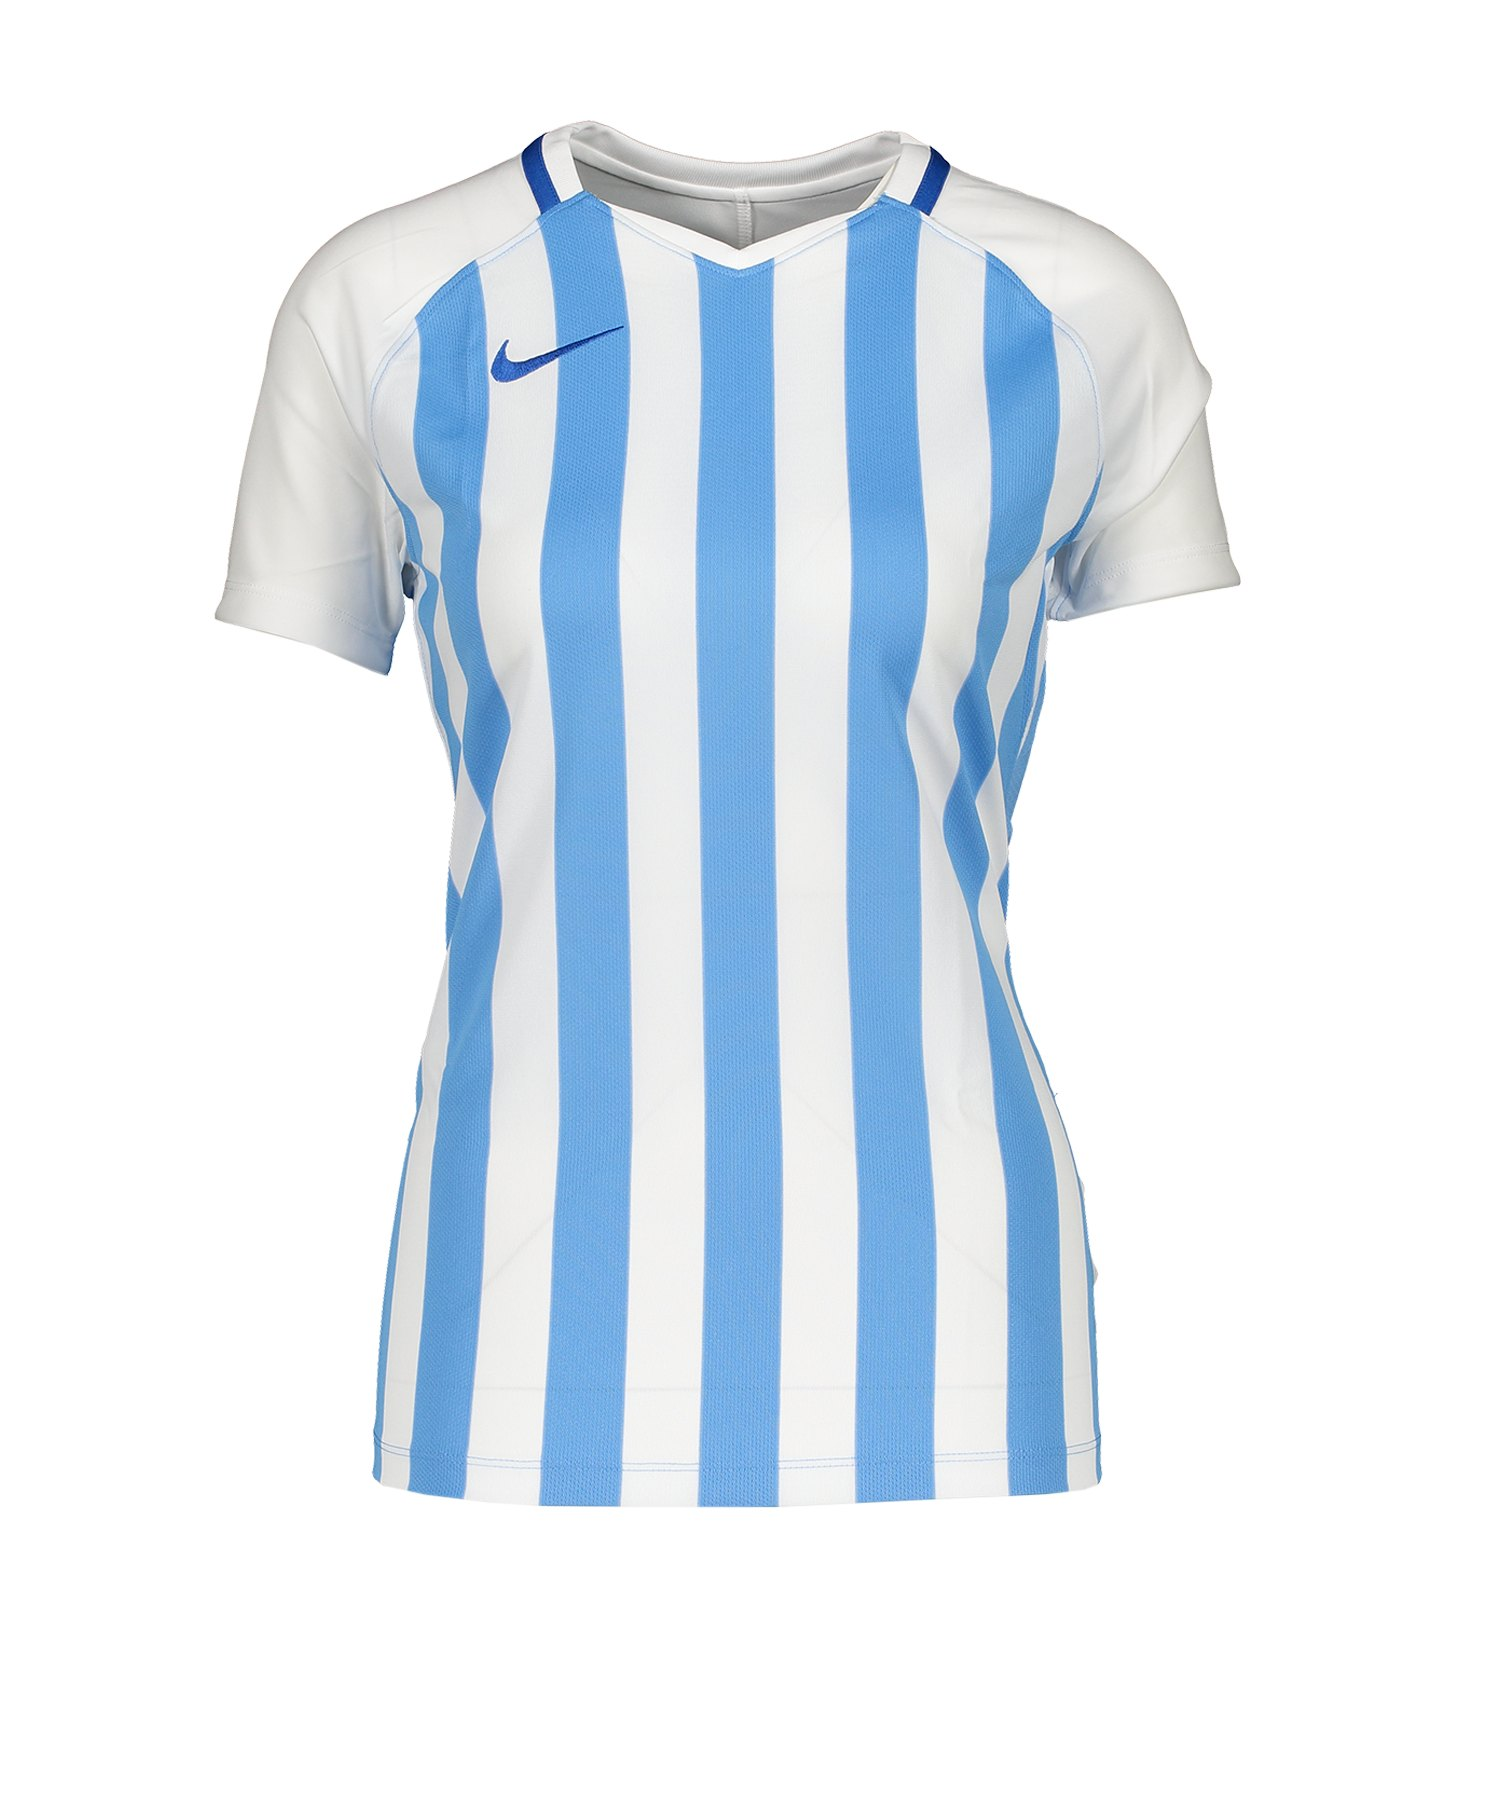 Nike Striped Division III Trikot KA Damen F413 - blau